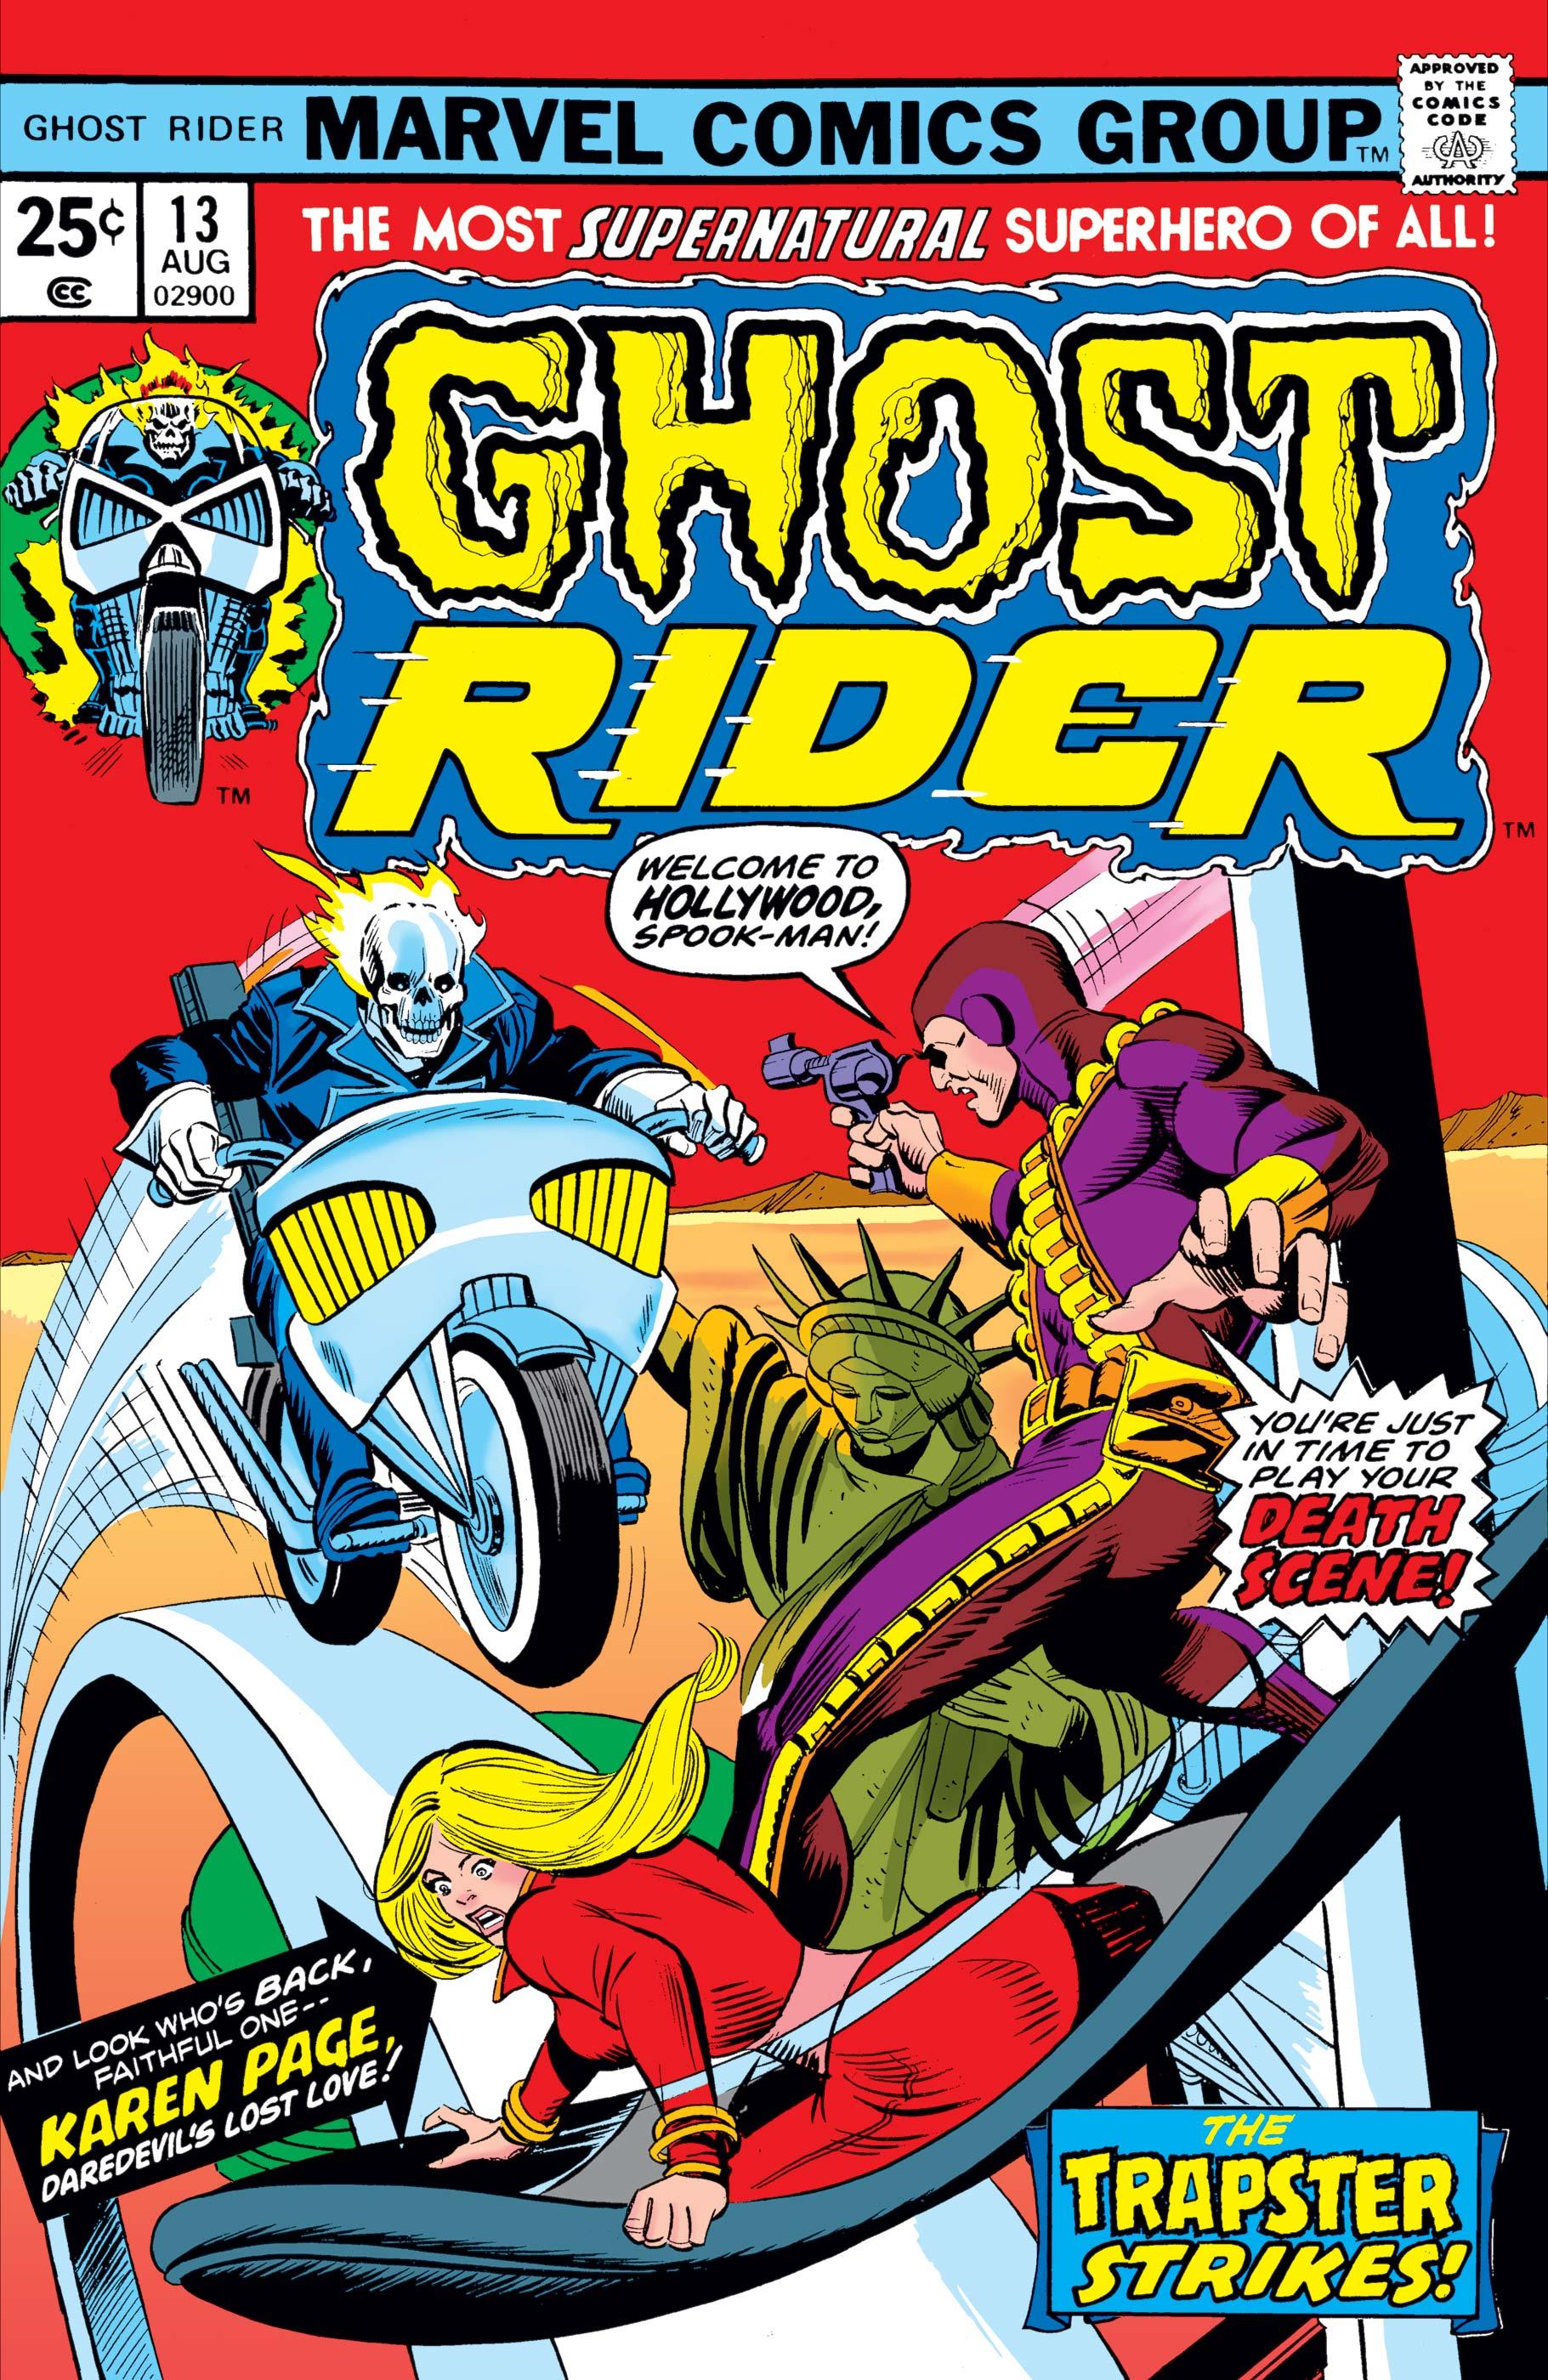 Ghost Rider (1973) #13